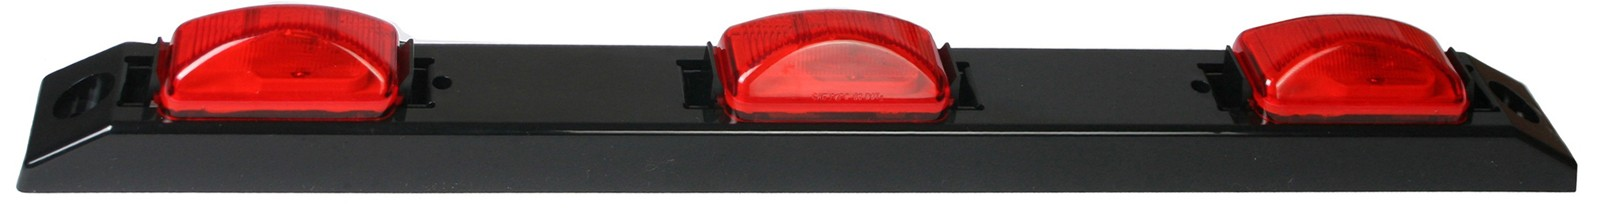 "16"" Long Plastic Submersible Incandescent 3 Bar Light"